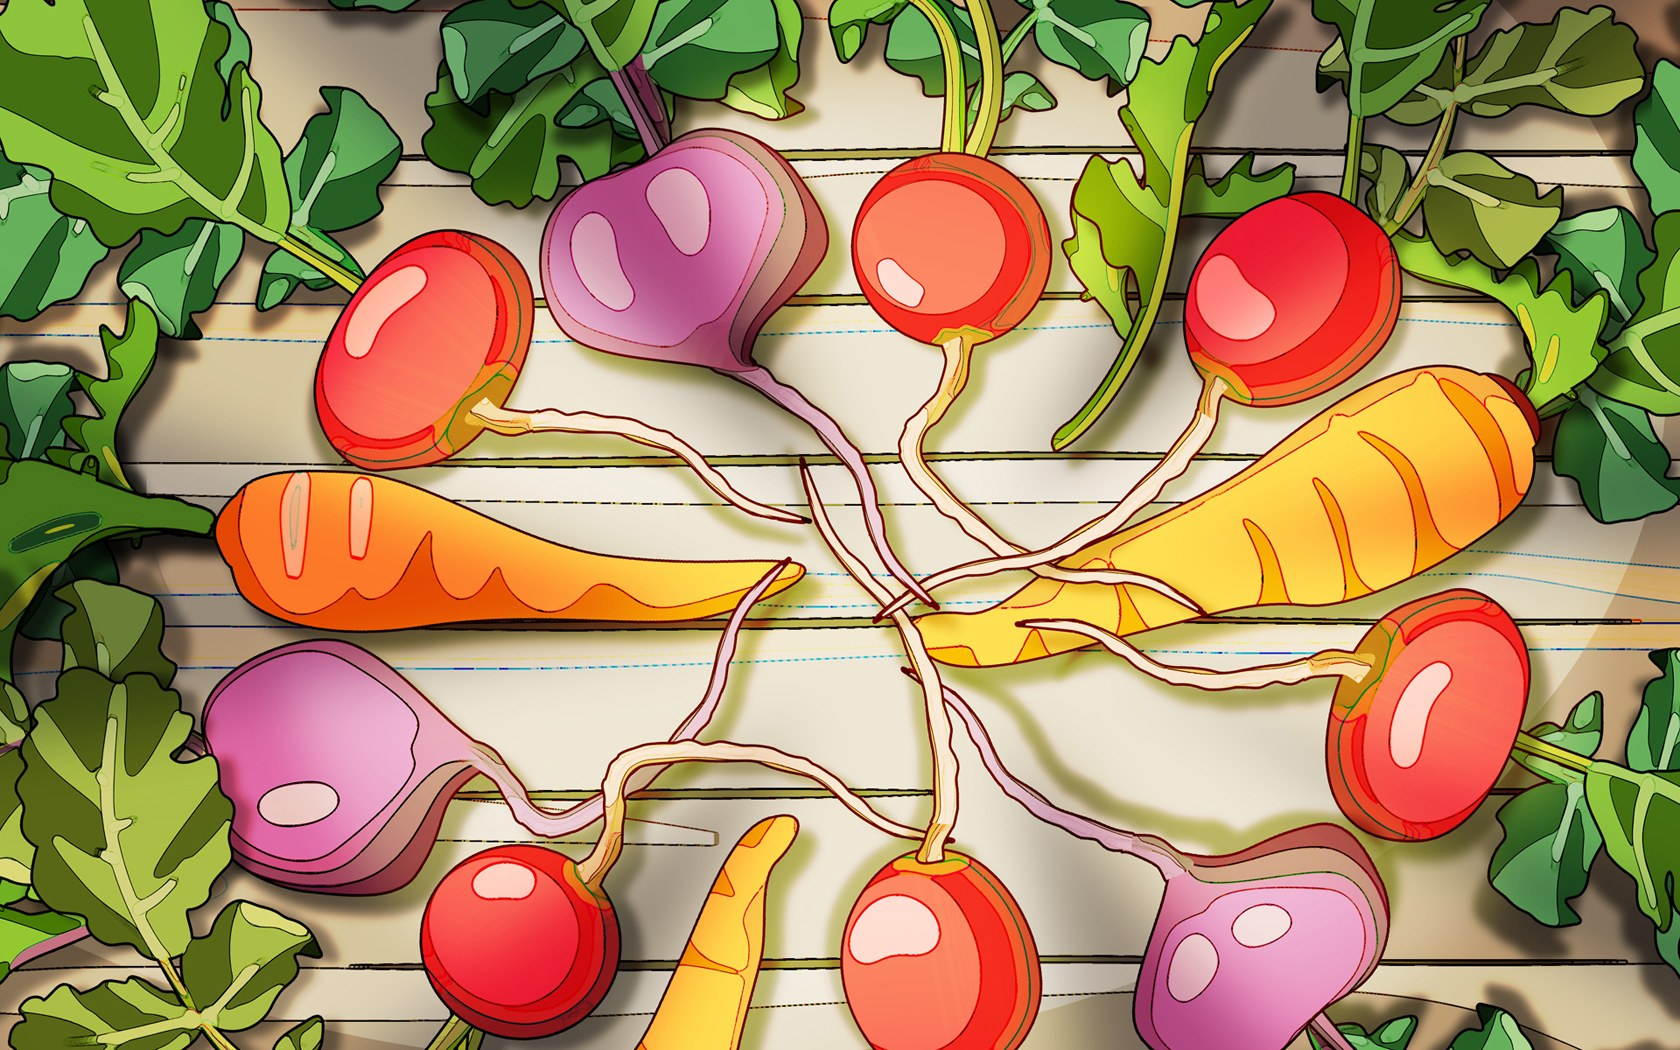 food desserts vegetable and fruits 1680x1050 NO33 Desktop Wallpaper 1680x1050